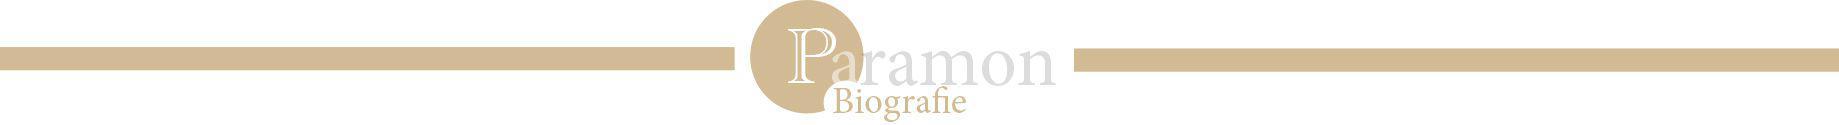 Biografie-Verlag-Paramon